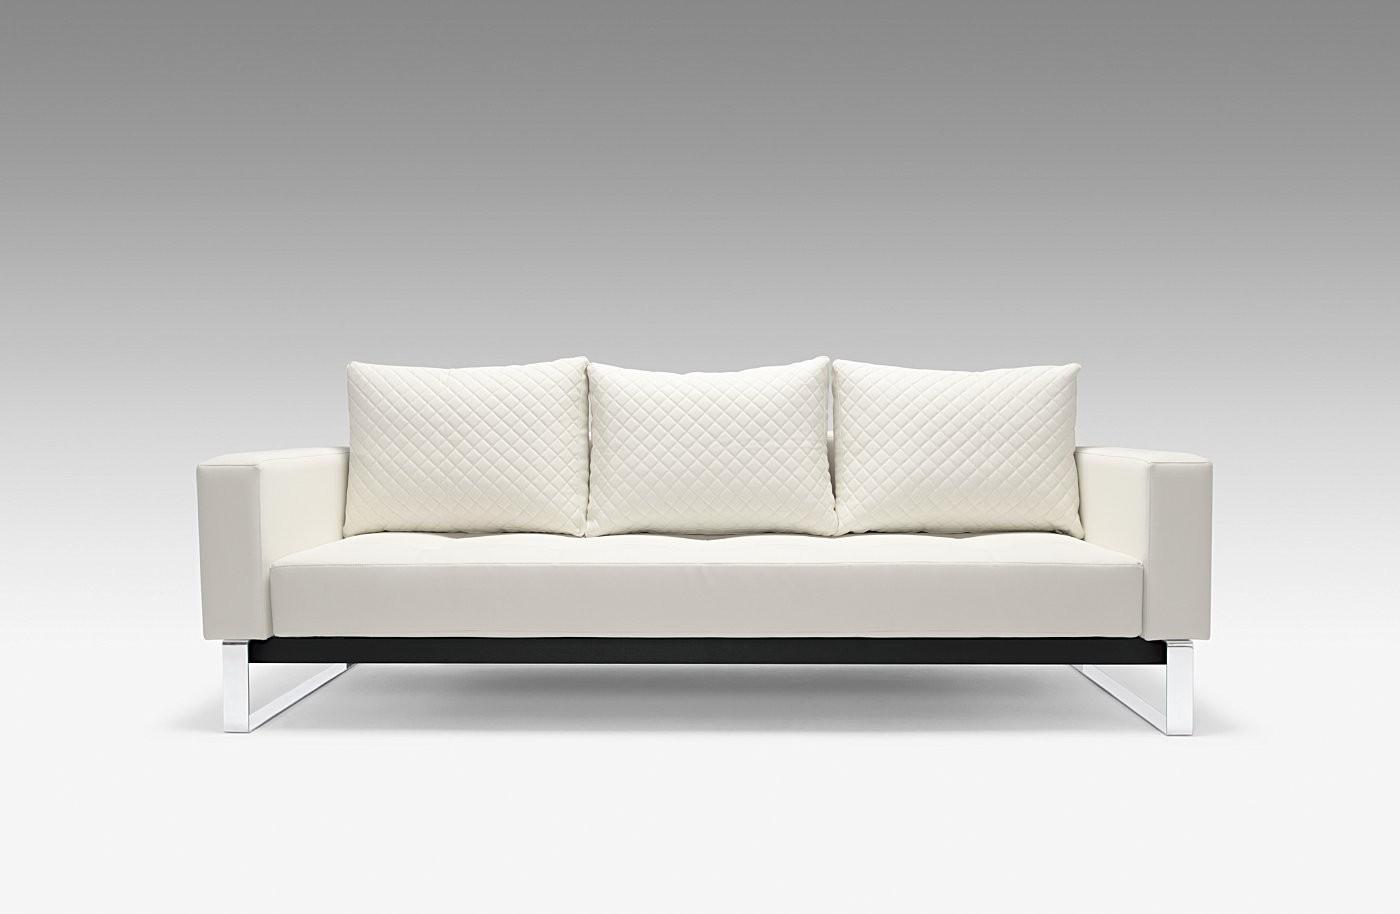 Cassius Q Deluxe Sofa Bed Buy From Nova Interiors